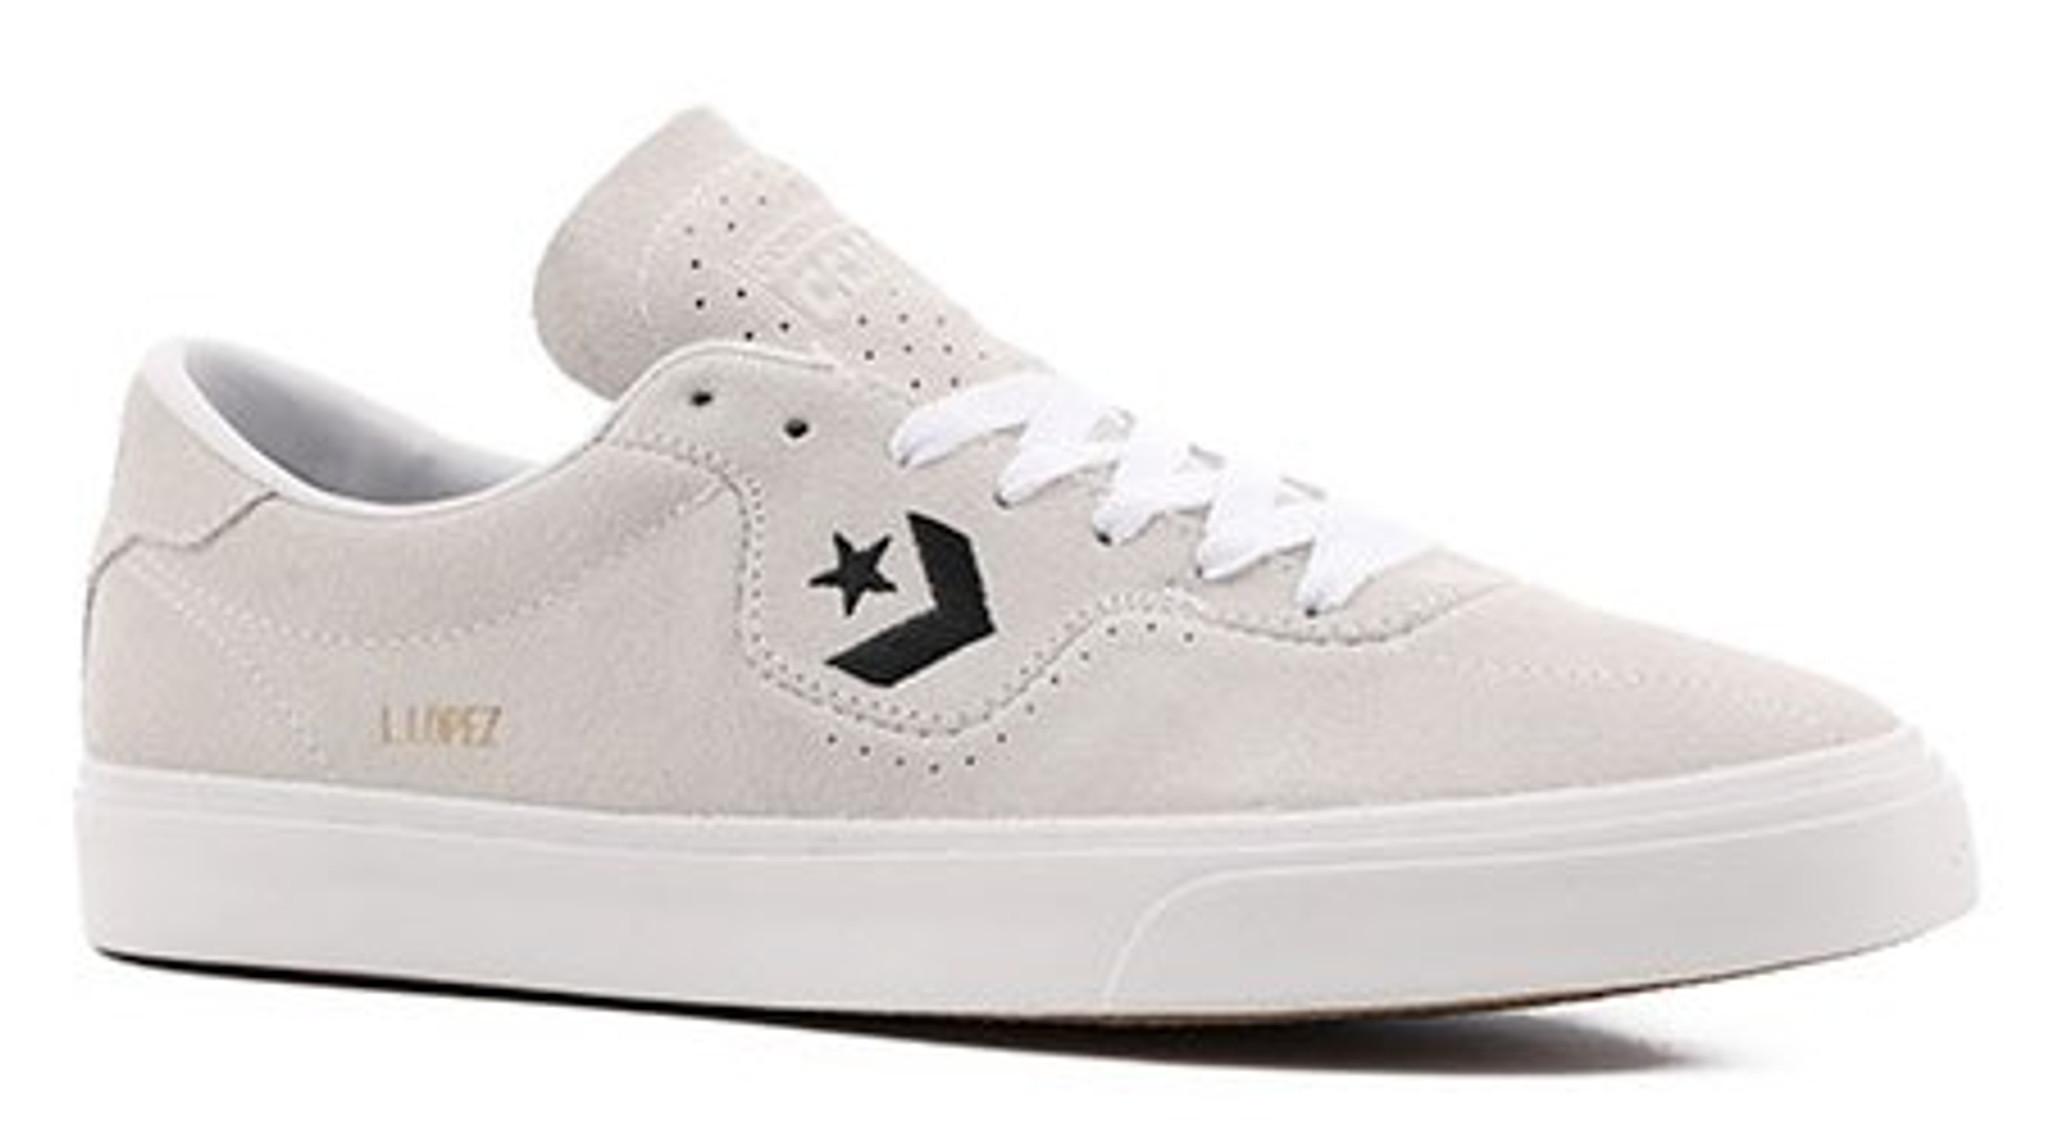 Converse - Louie Lopez - White/Black